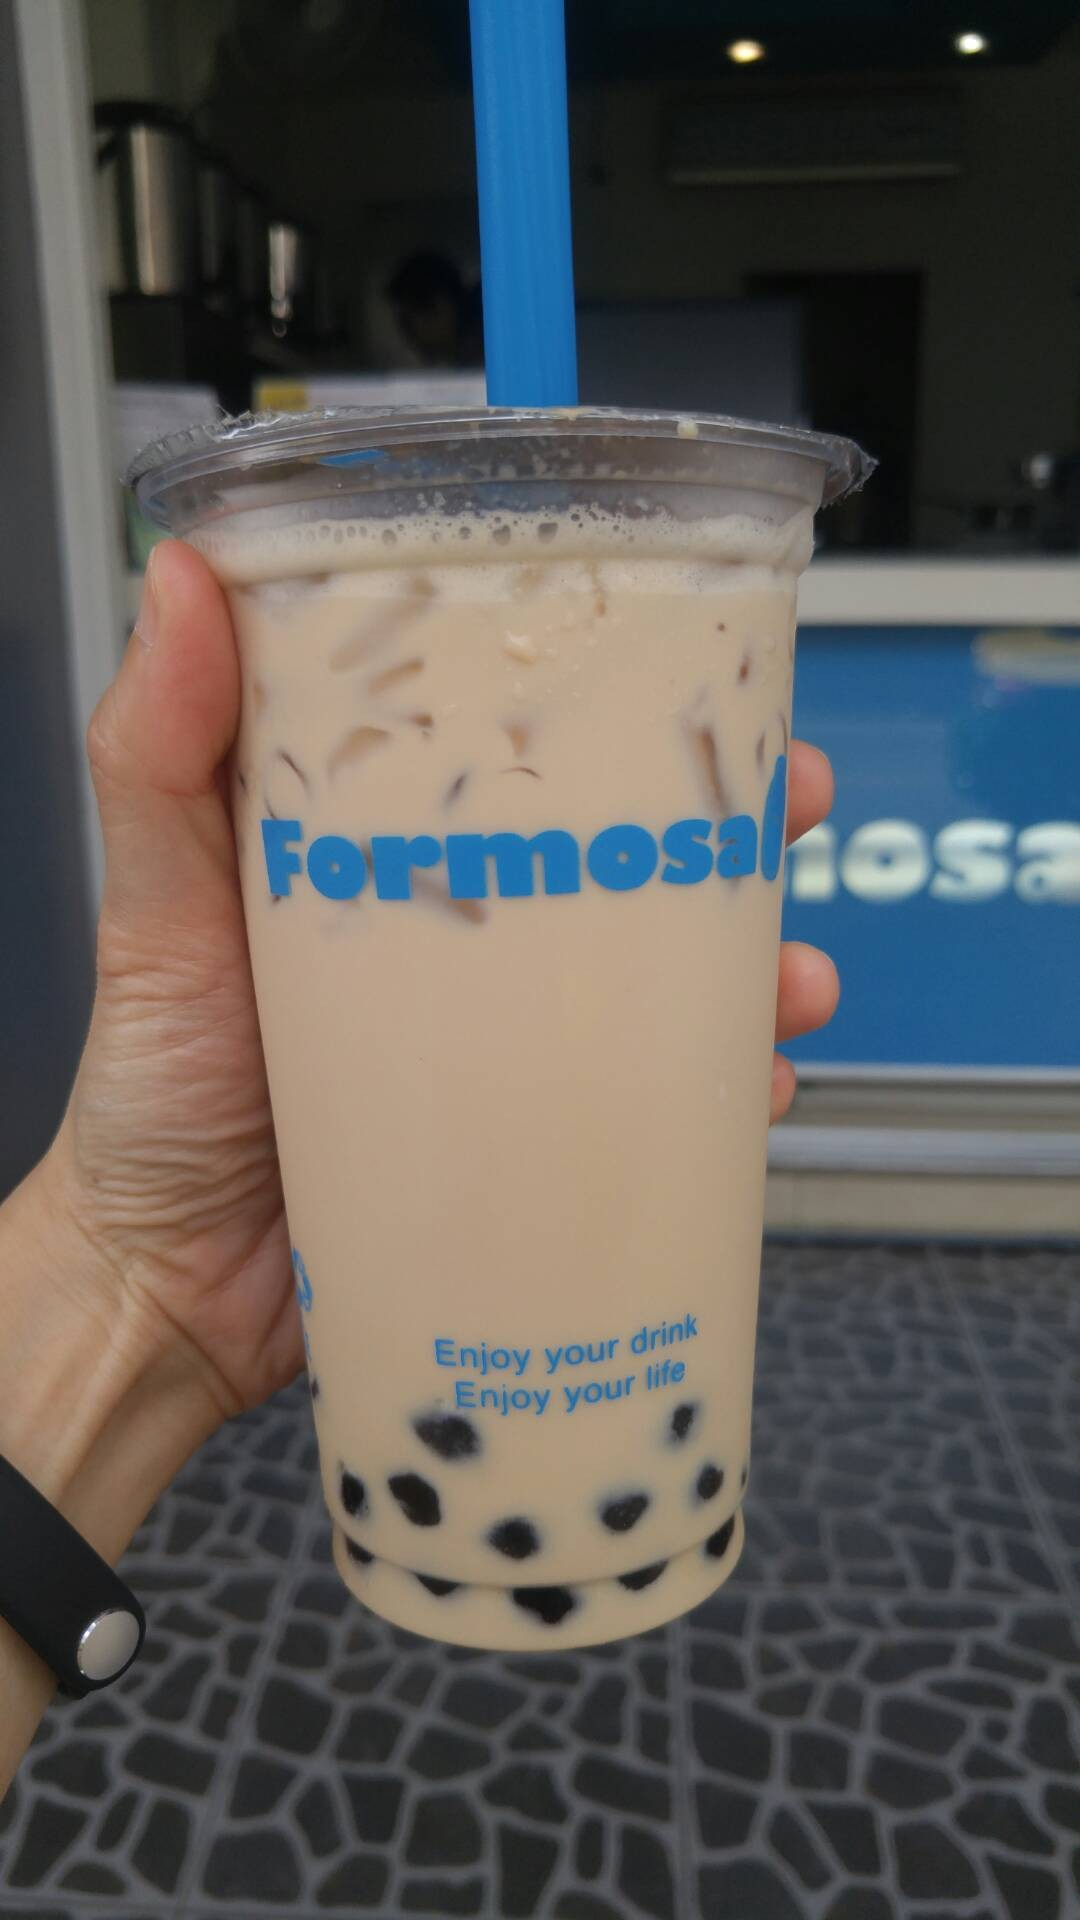 Formosa (FMS) ชานมไข่มุก ซอย ม.หอการค้าไทย